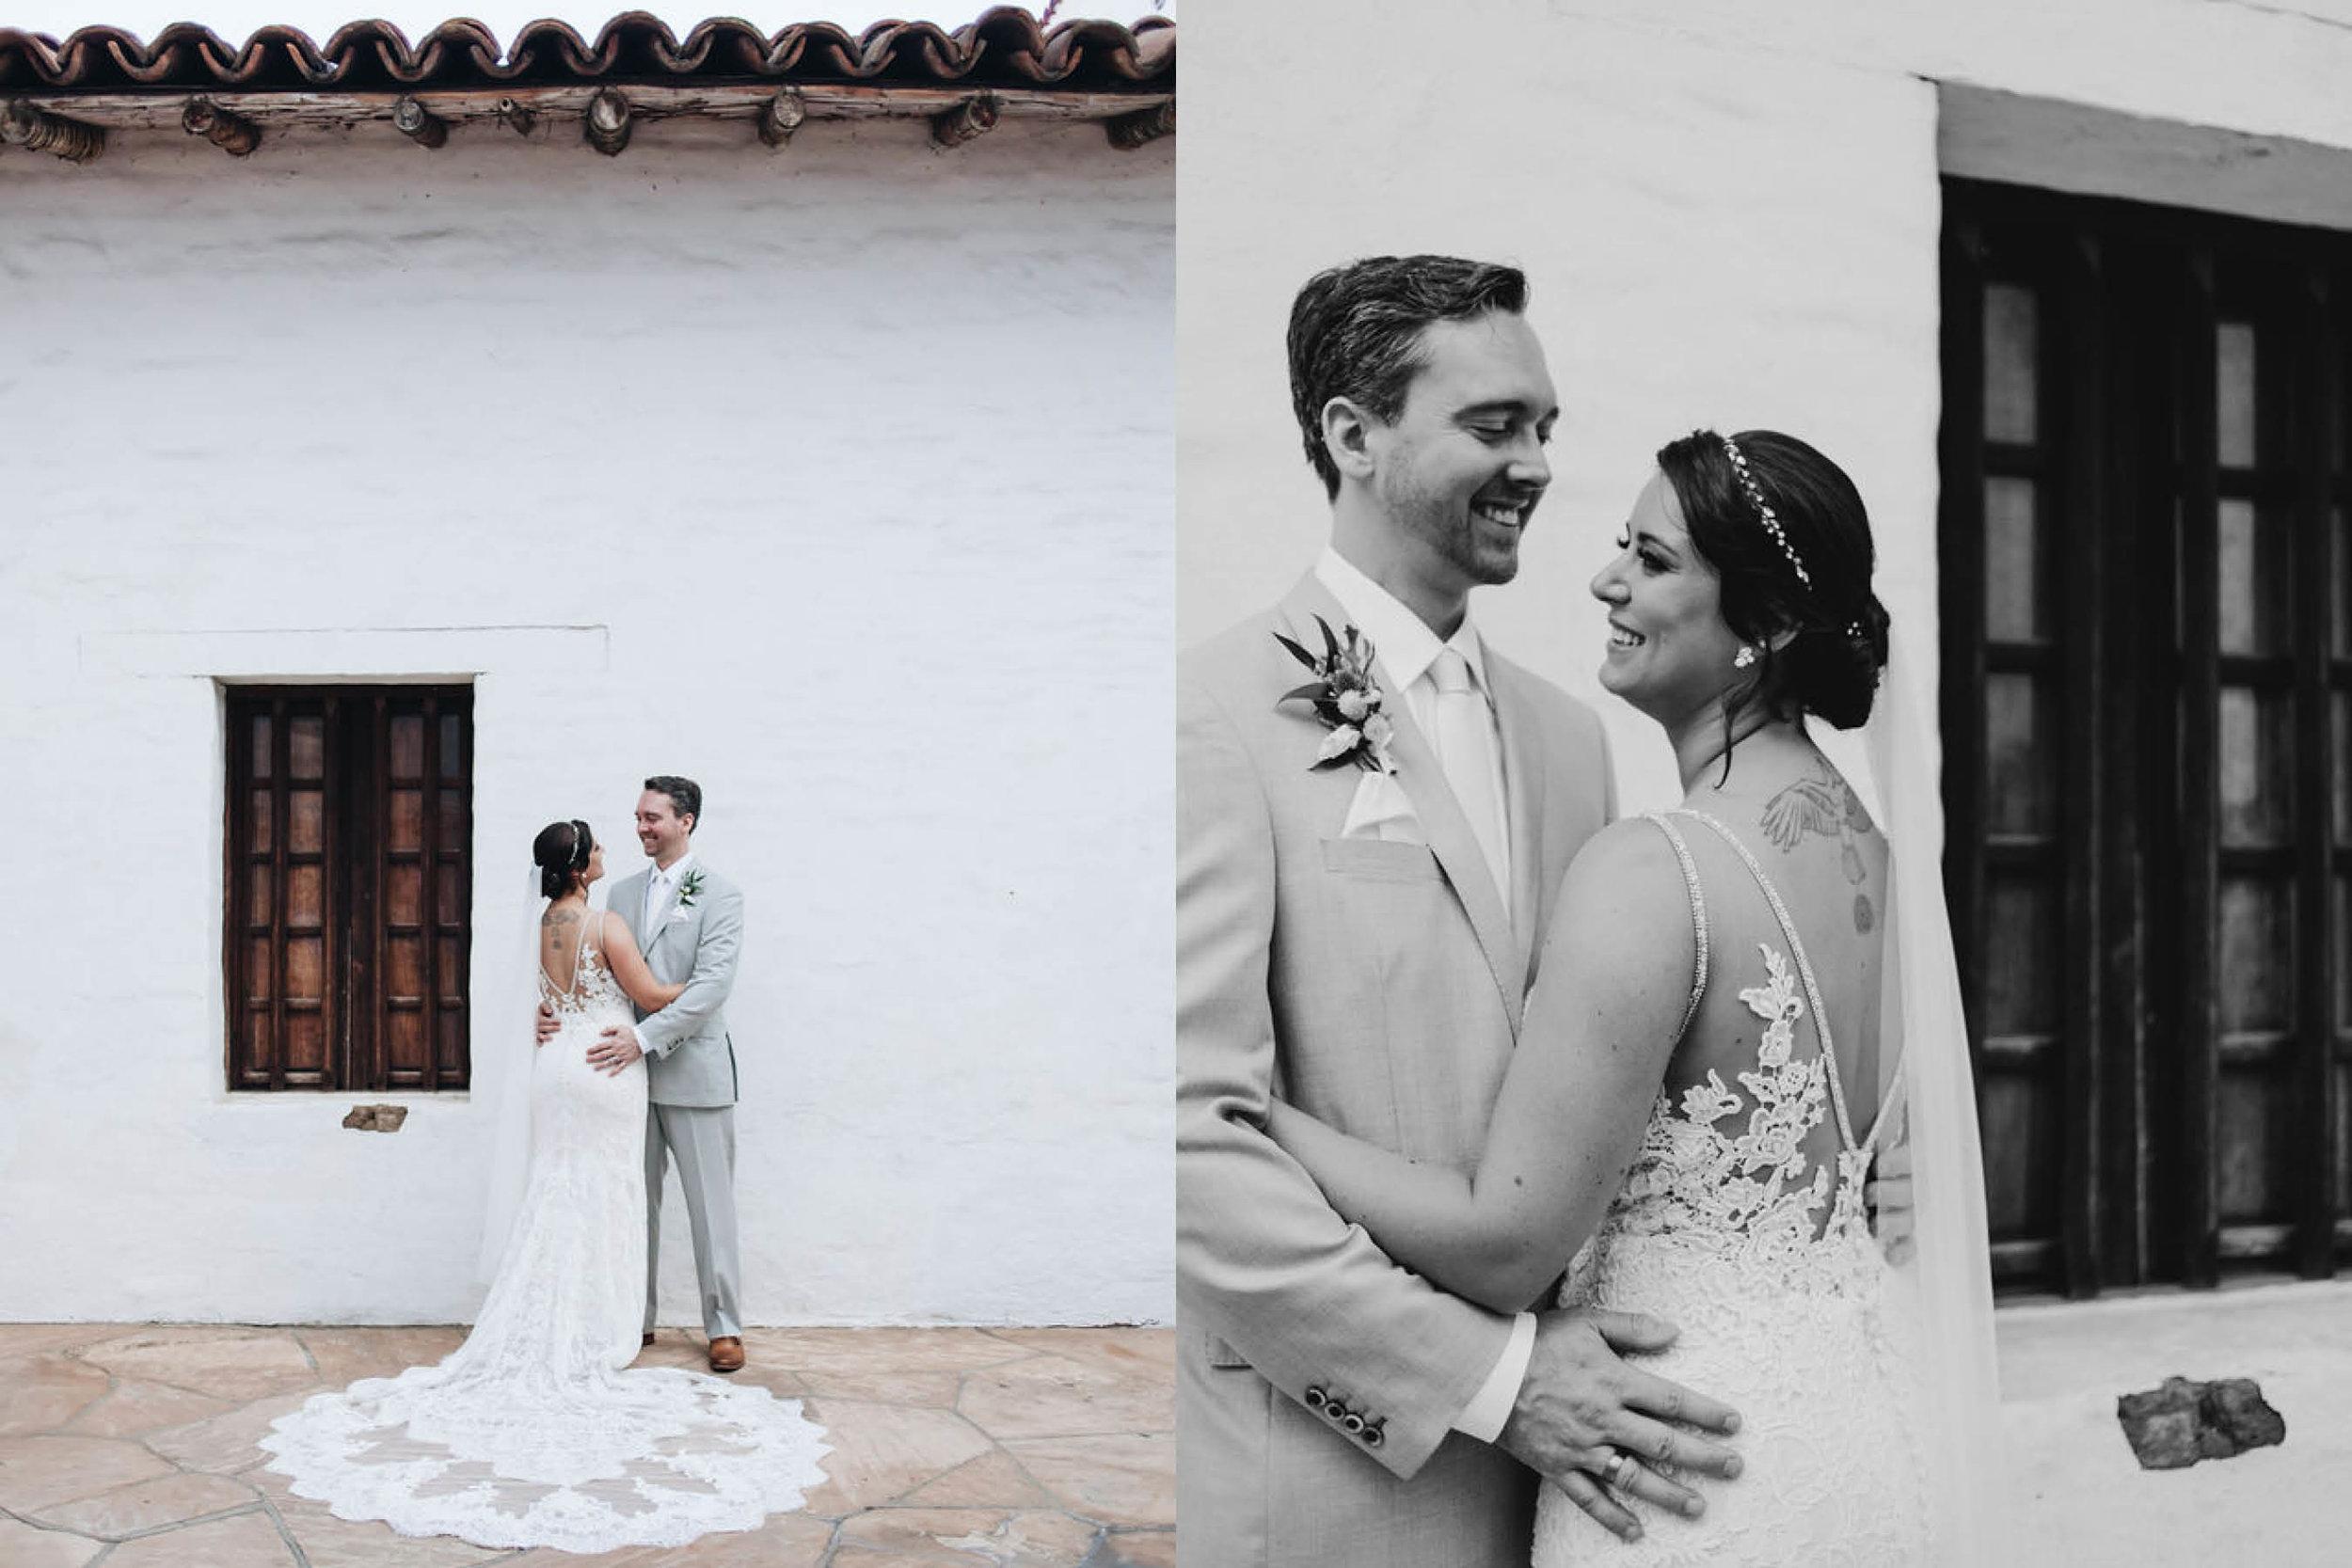 santa-barbara-elopement-wedding-planner-planning-coordination-day-of-coordinator-downtown-garden-oasis-float-spa-fountain-blue-white-event-design-vintage-china (23).jpg